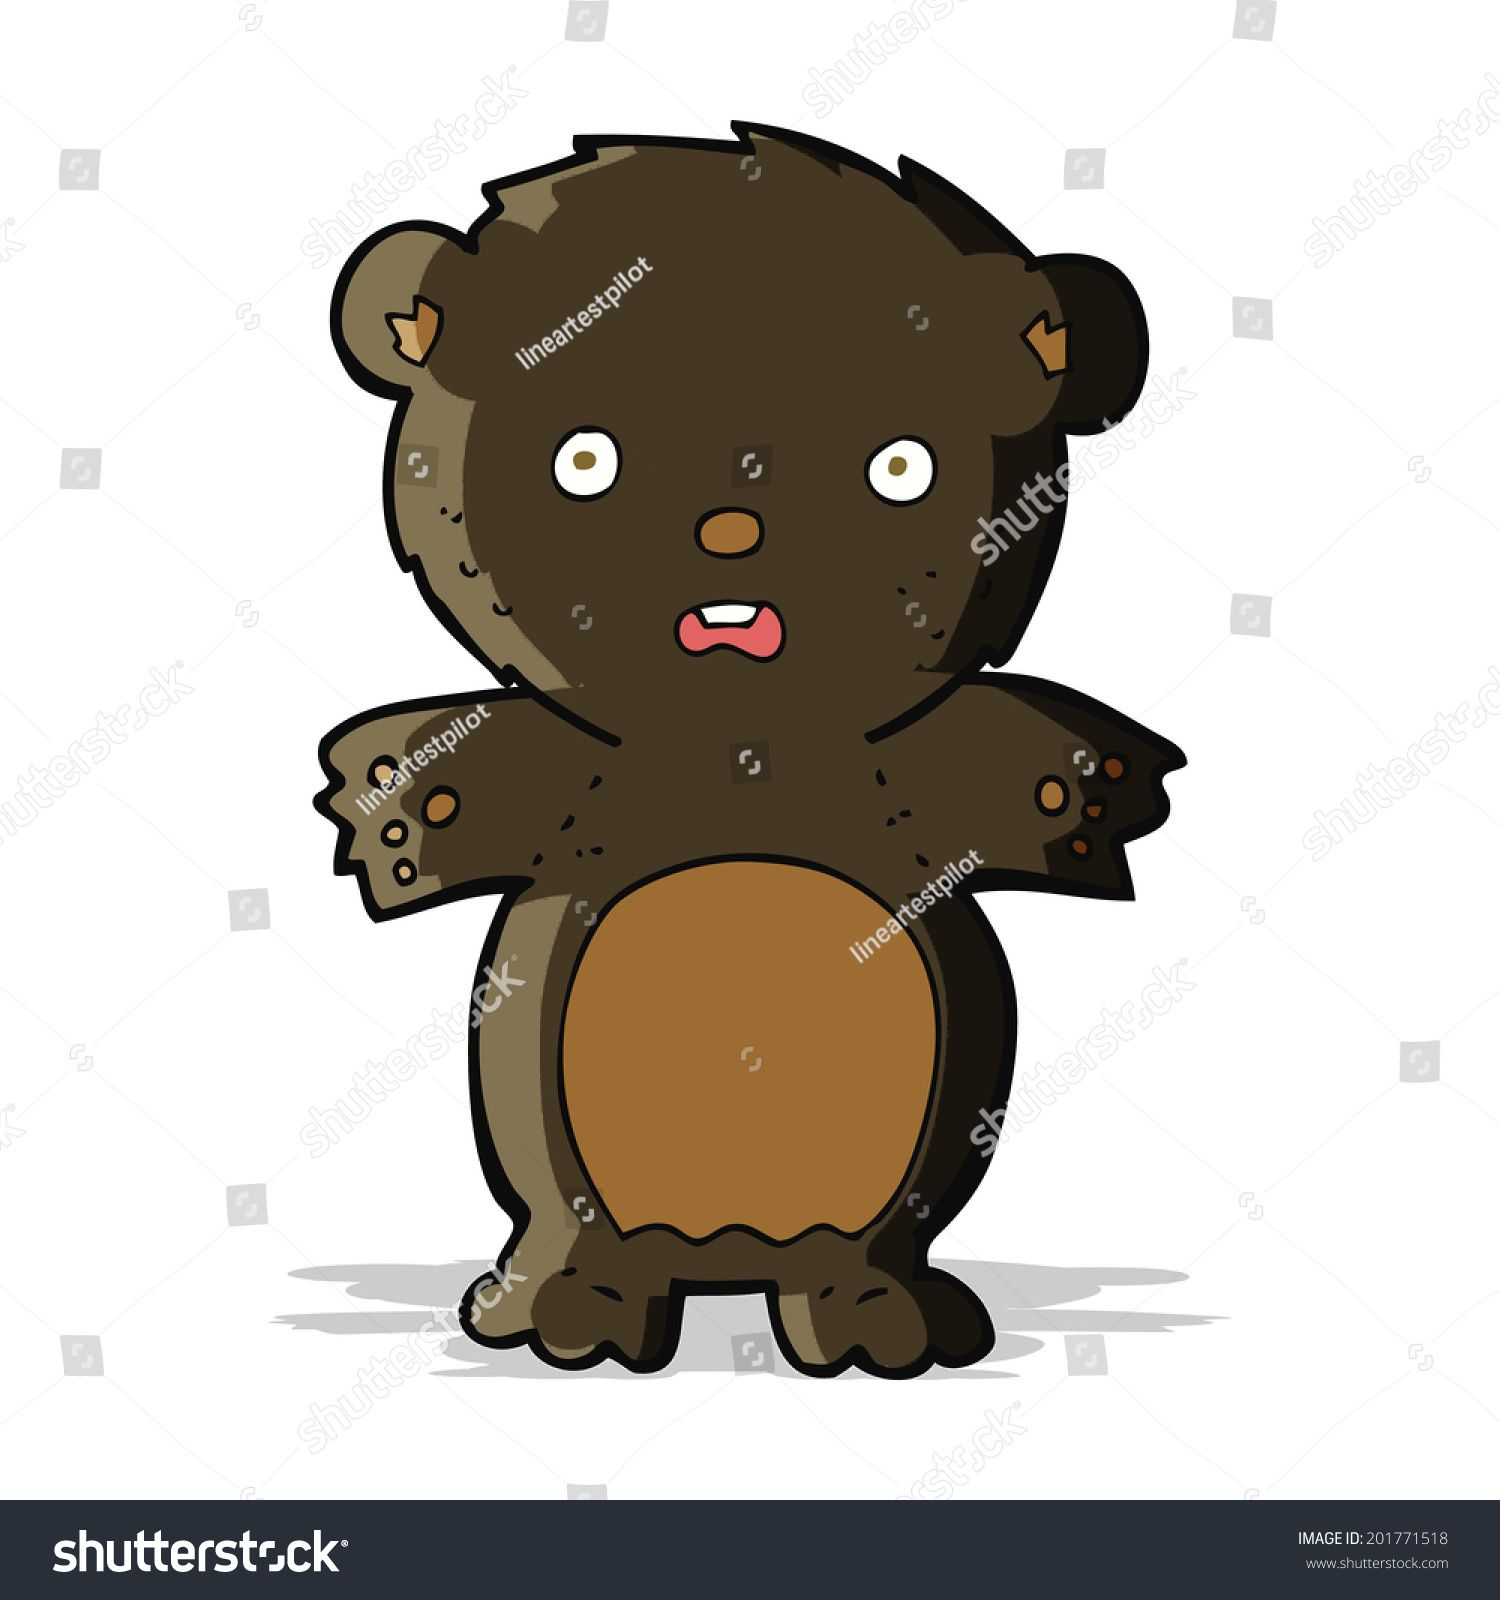 Frightened Black Bear Cartoon Ad Sponsored Black Frightened Cartoon Bear Bear Cartoon Art Design Creative